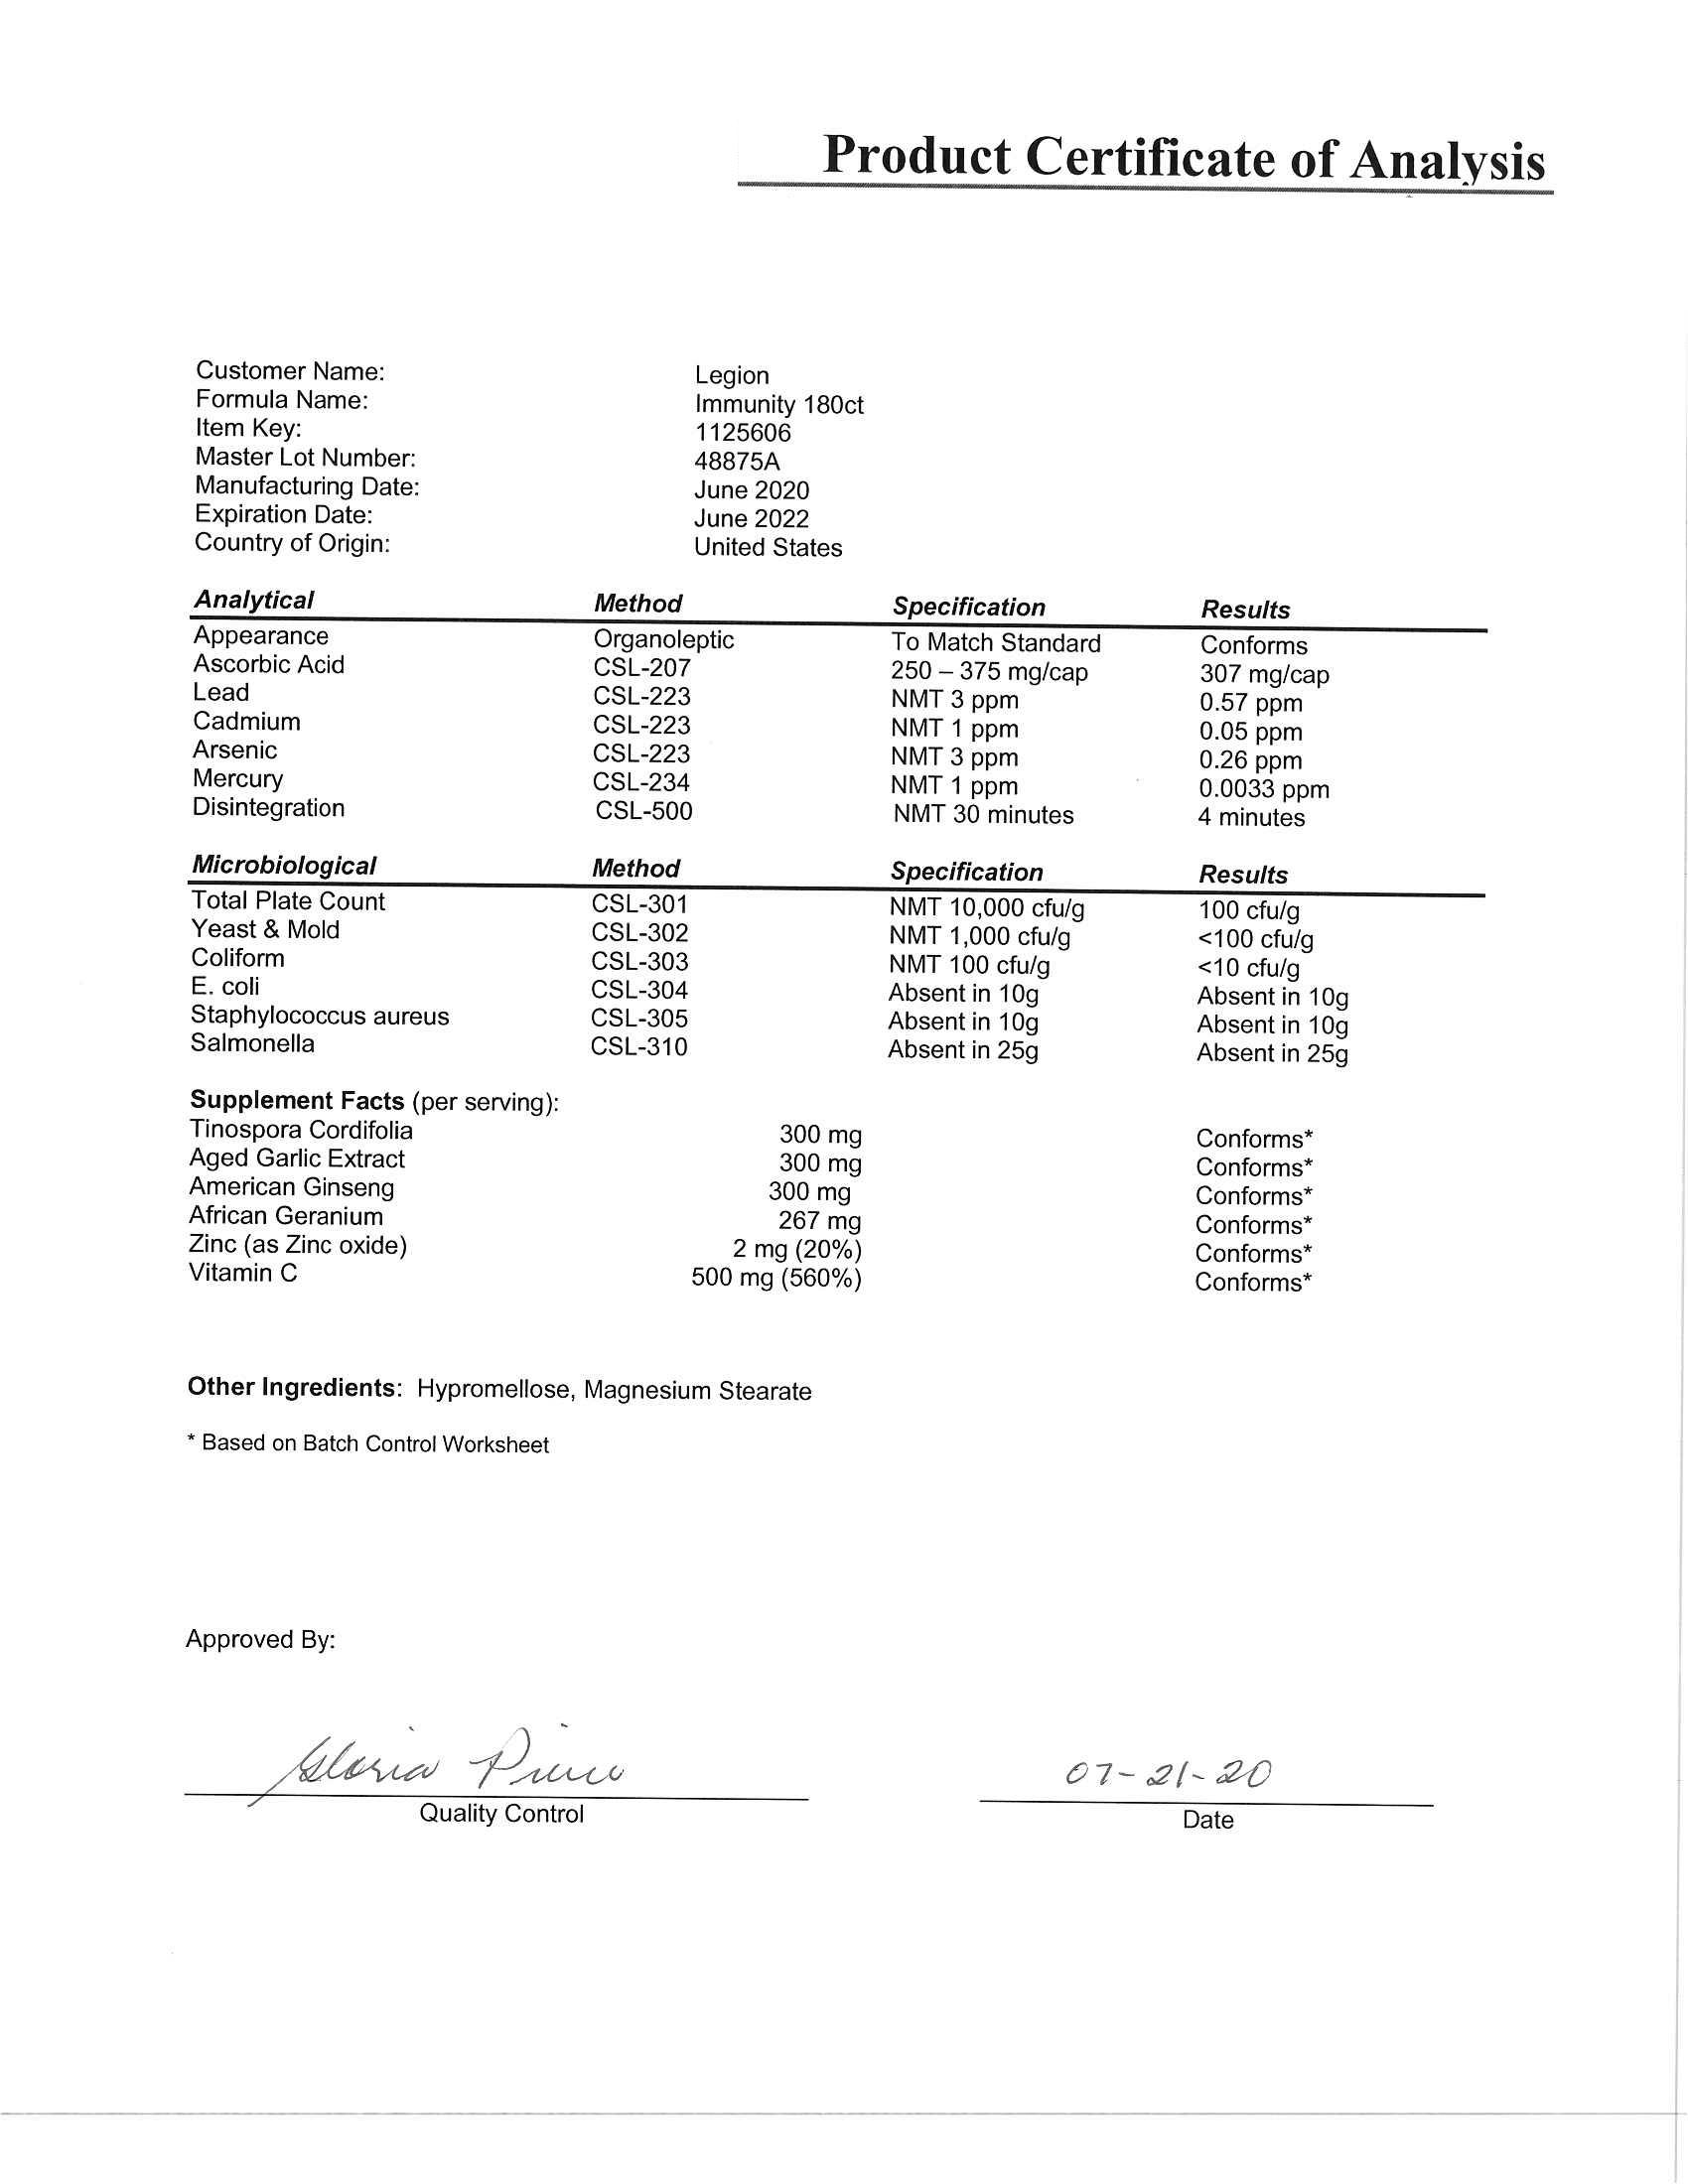 Immune Lab Test Certificate of Analysis